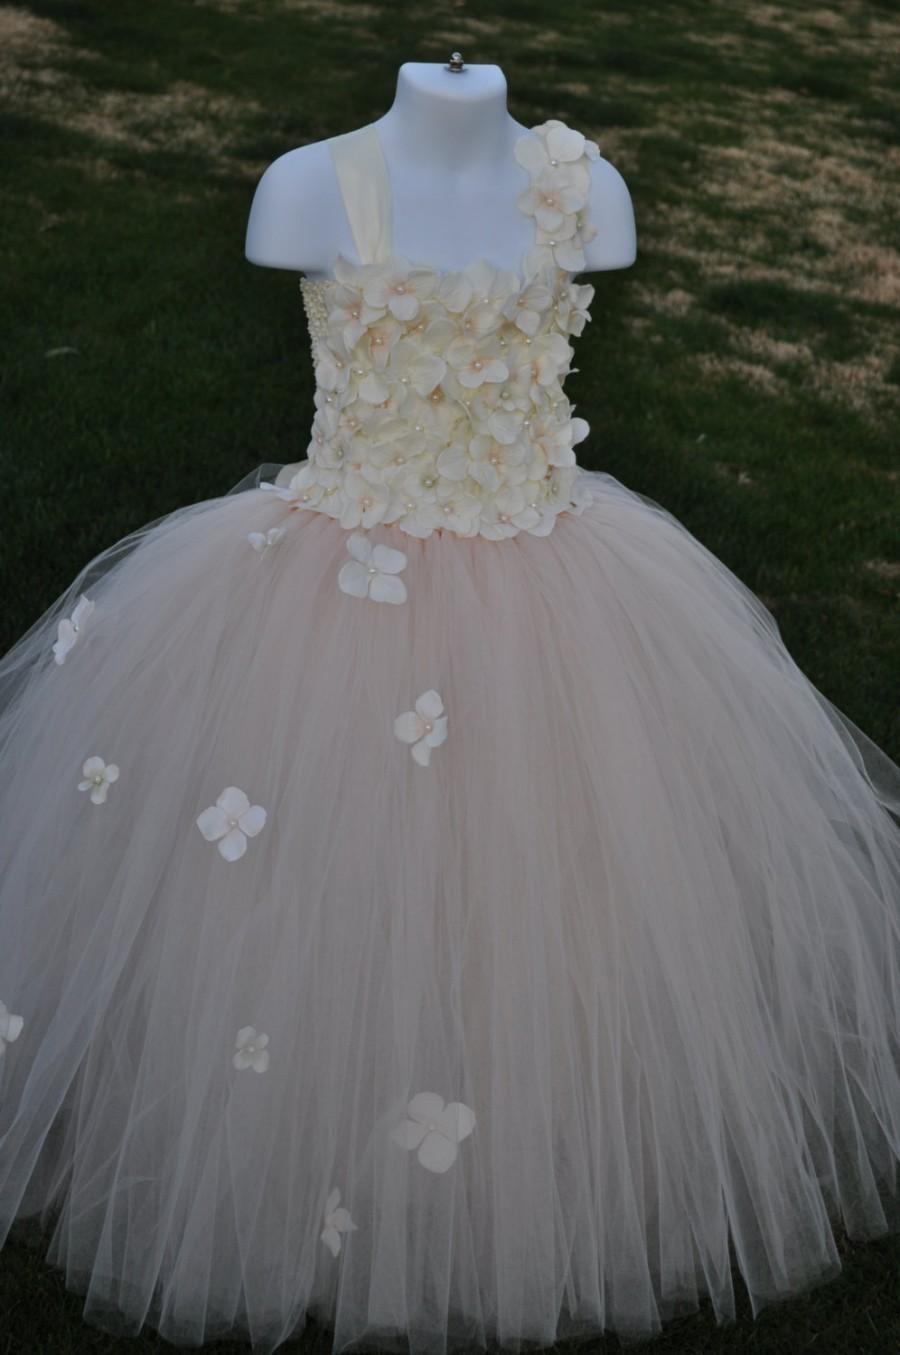 Wedding - Blush Tutu Dress, Blush Ivory Flower Girl Dress,Infant Blush Dress,Baby Pink Dress,Toddler Blush Tutu Dress, Special Occasion Blush Dress,